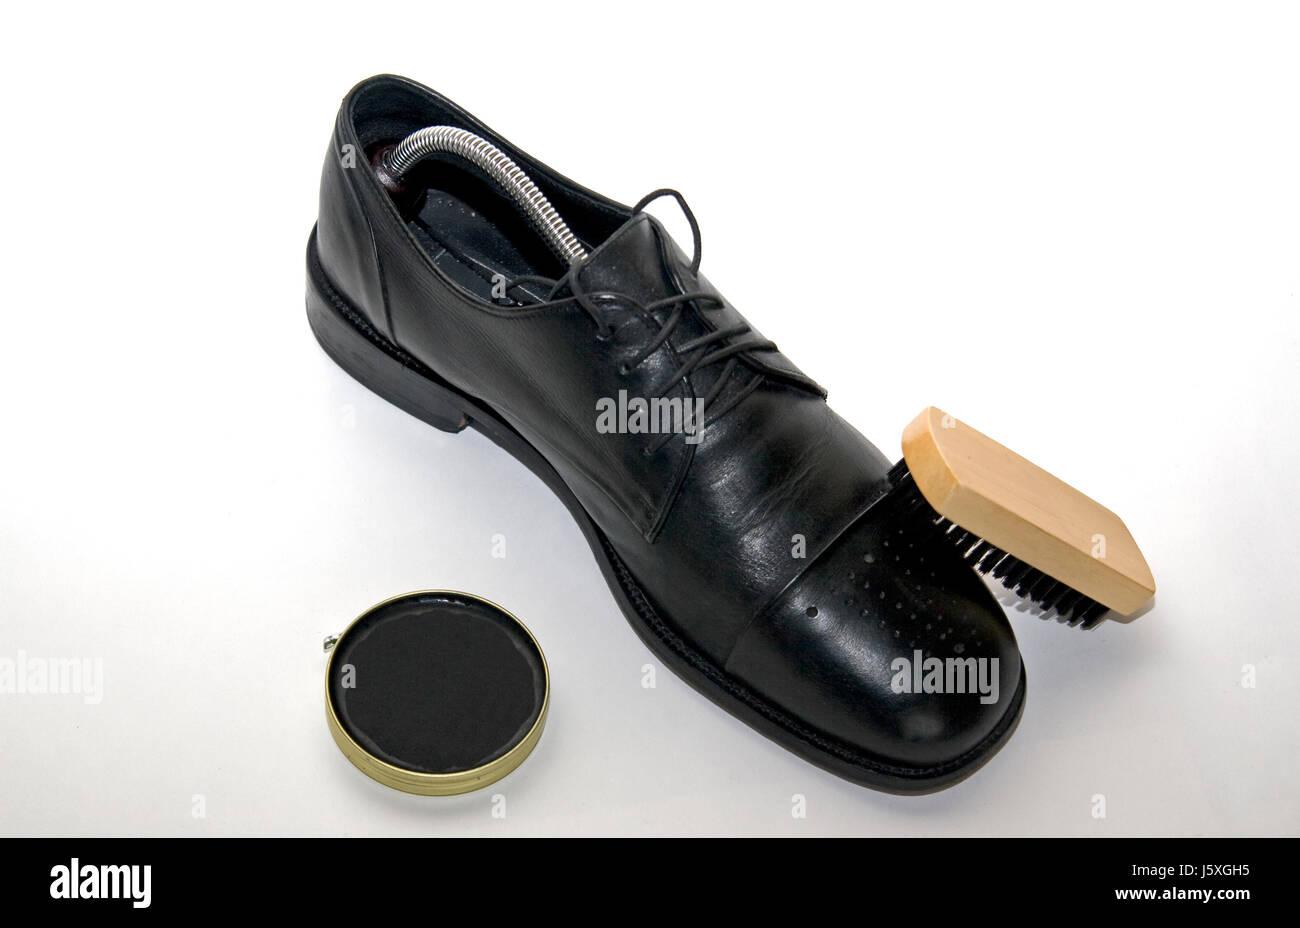 leather brush furbish clean shoepolish shoe black swarthy jetblack deep black Stock Photo